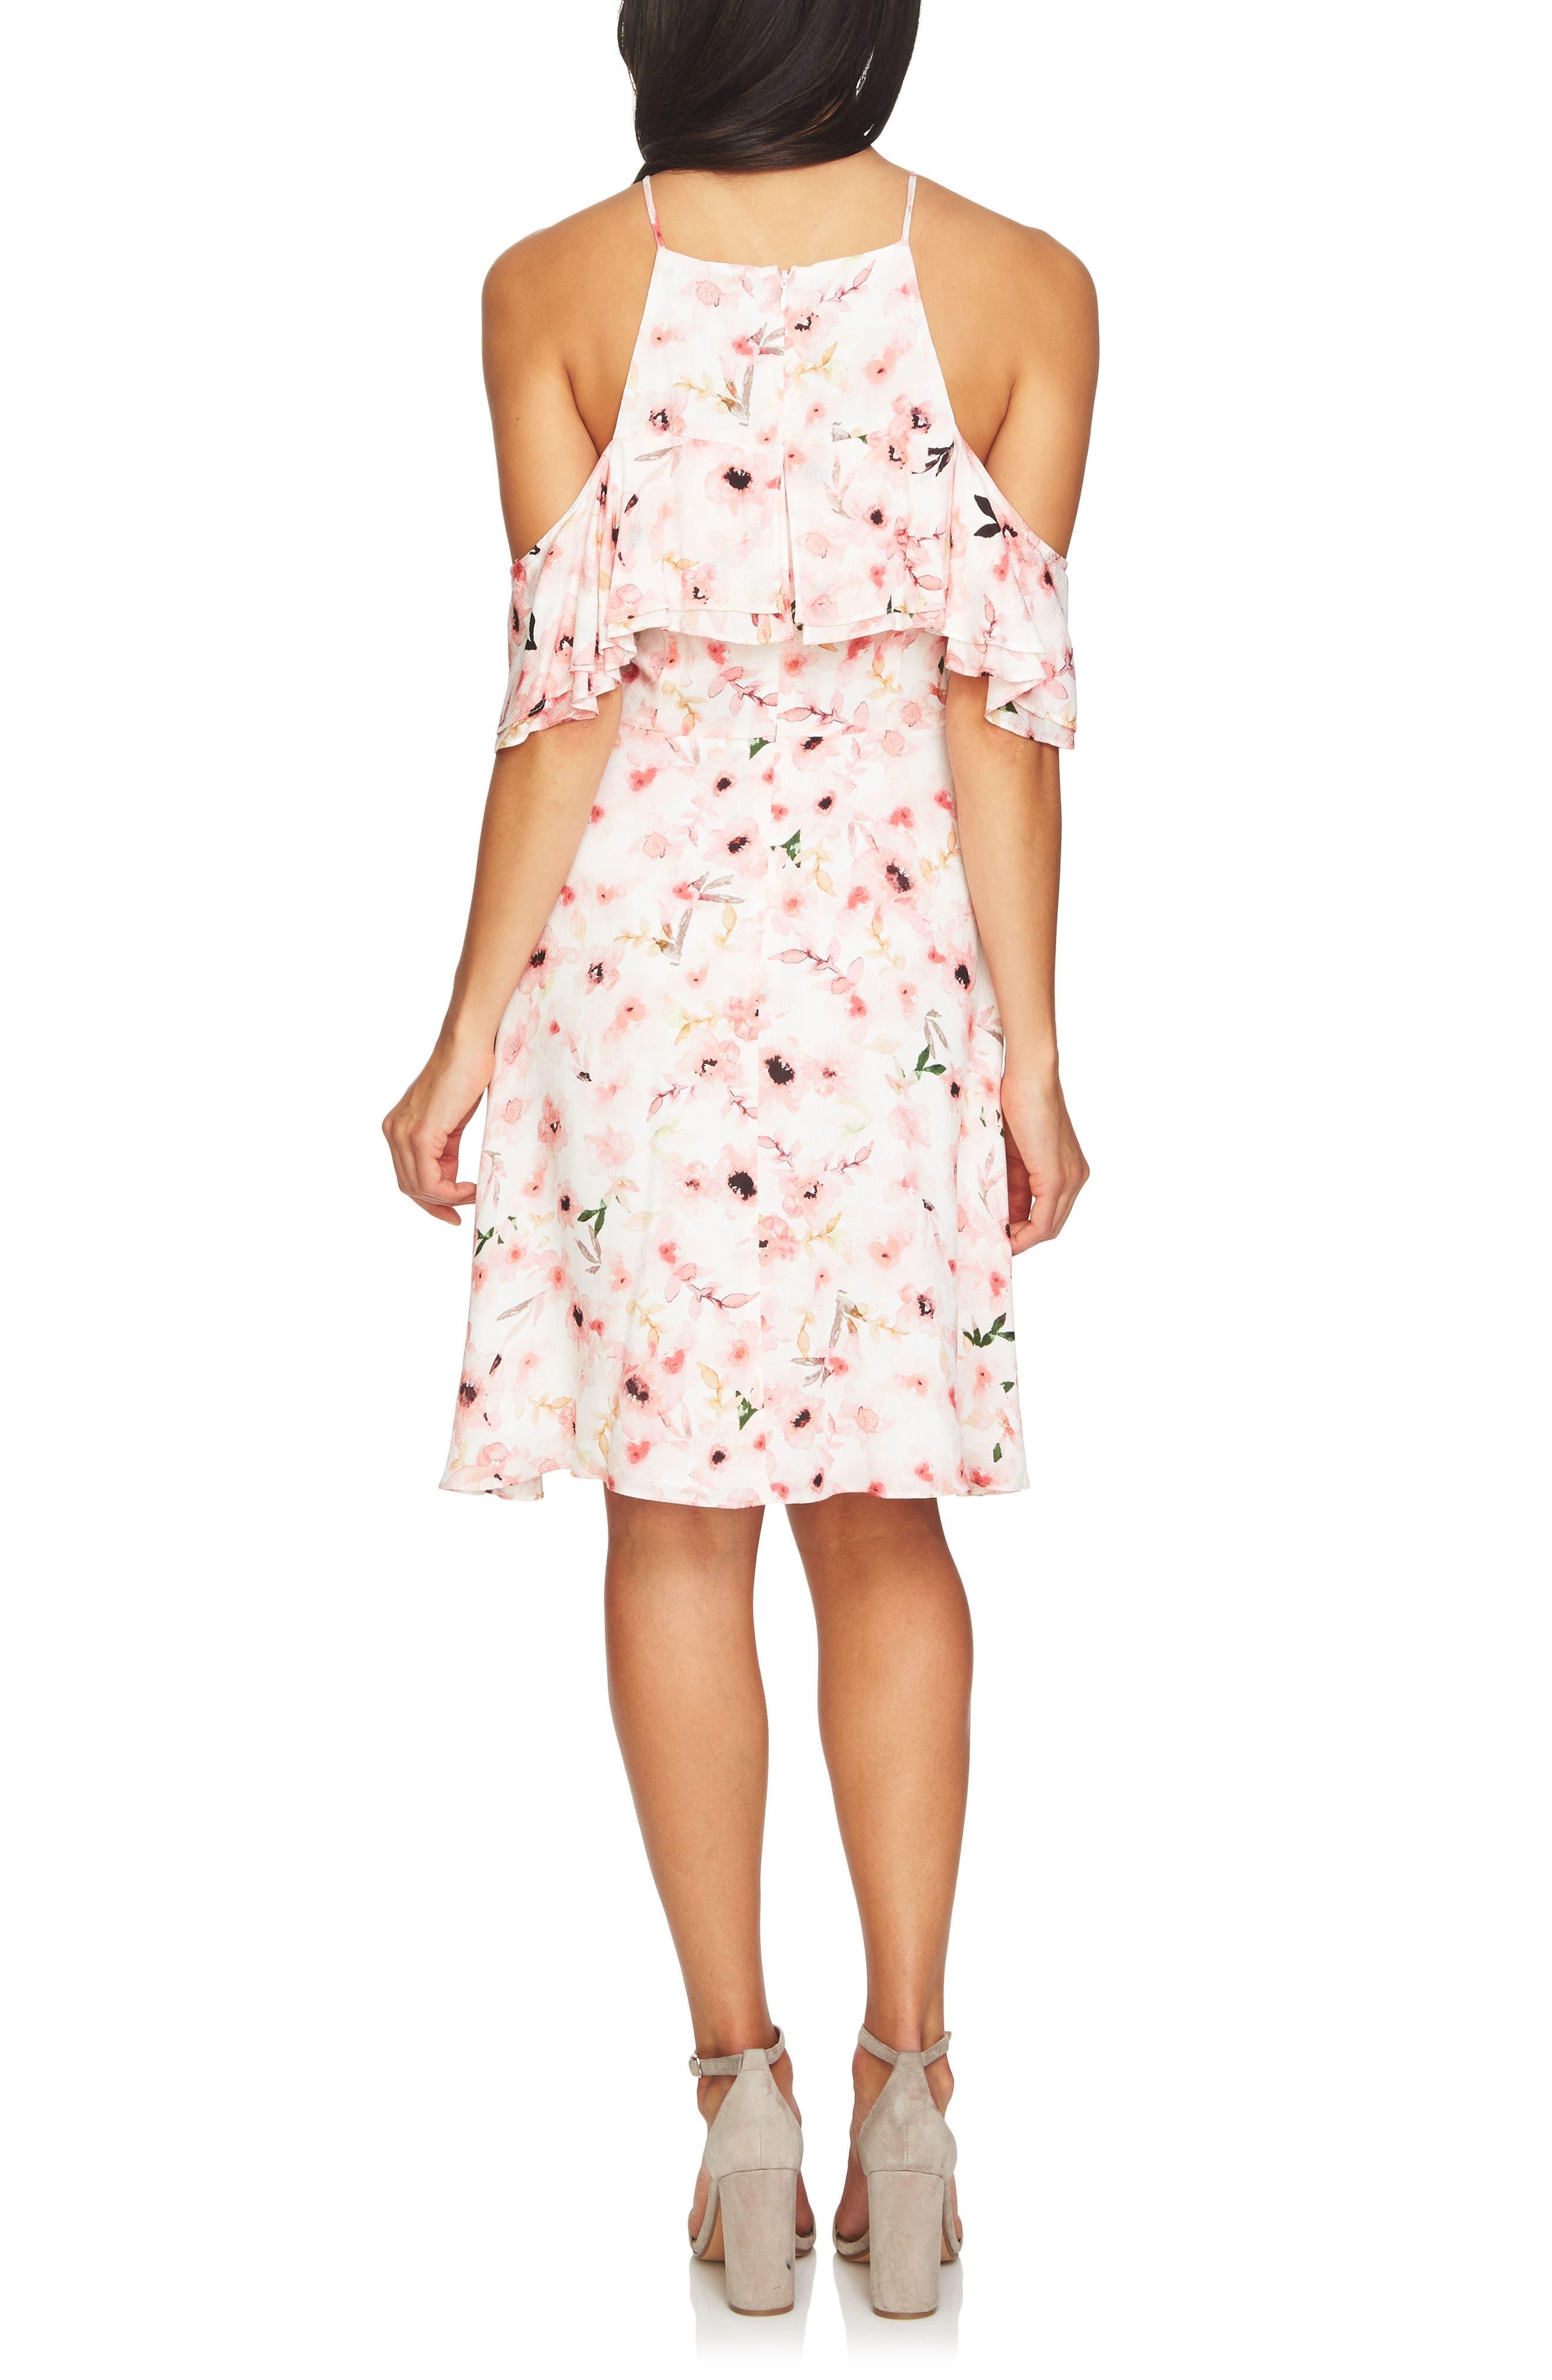 Arden Cold Shoulder Ruffle Dress,                             Alternate thumbnail 2, color,                             145